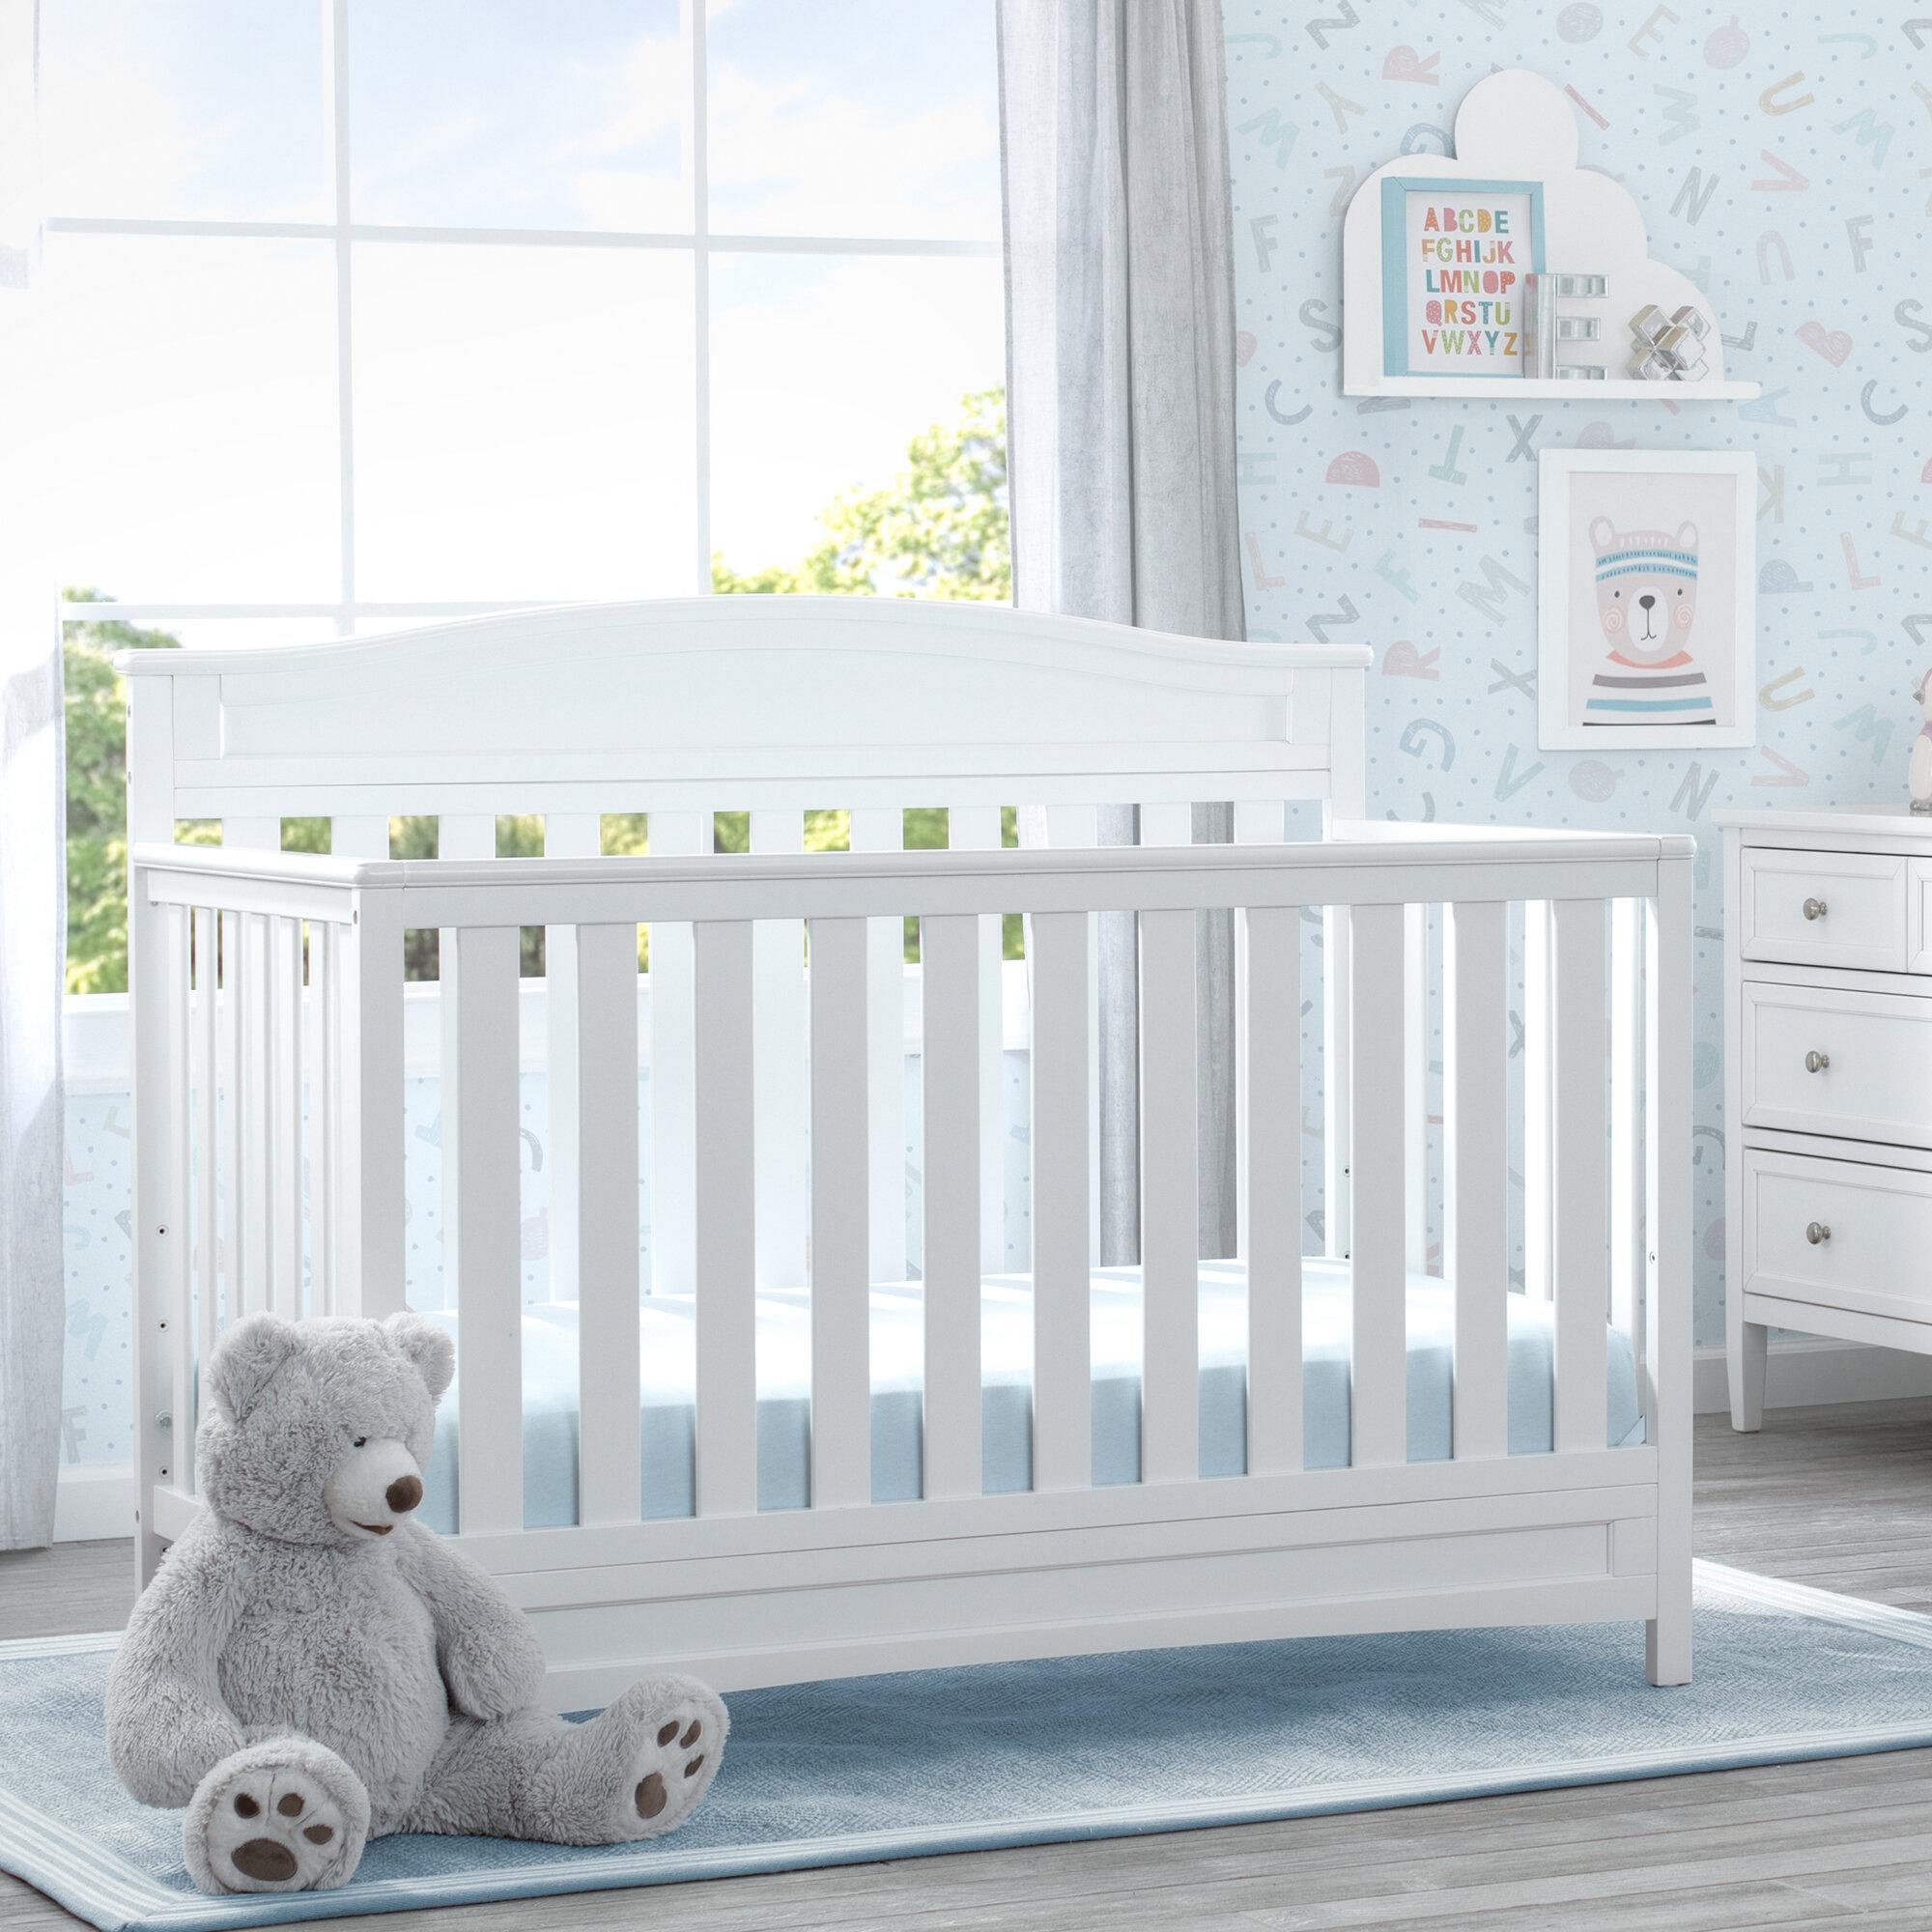 Wayfair   Black & White Cribs You'll Love in 21